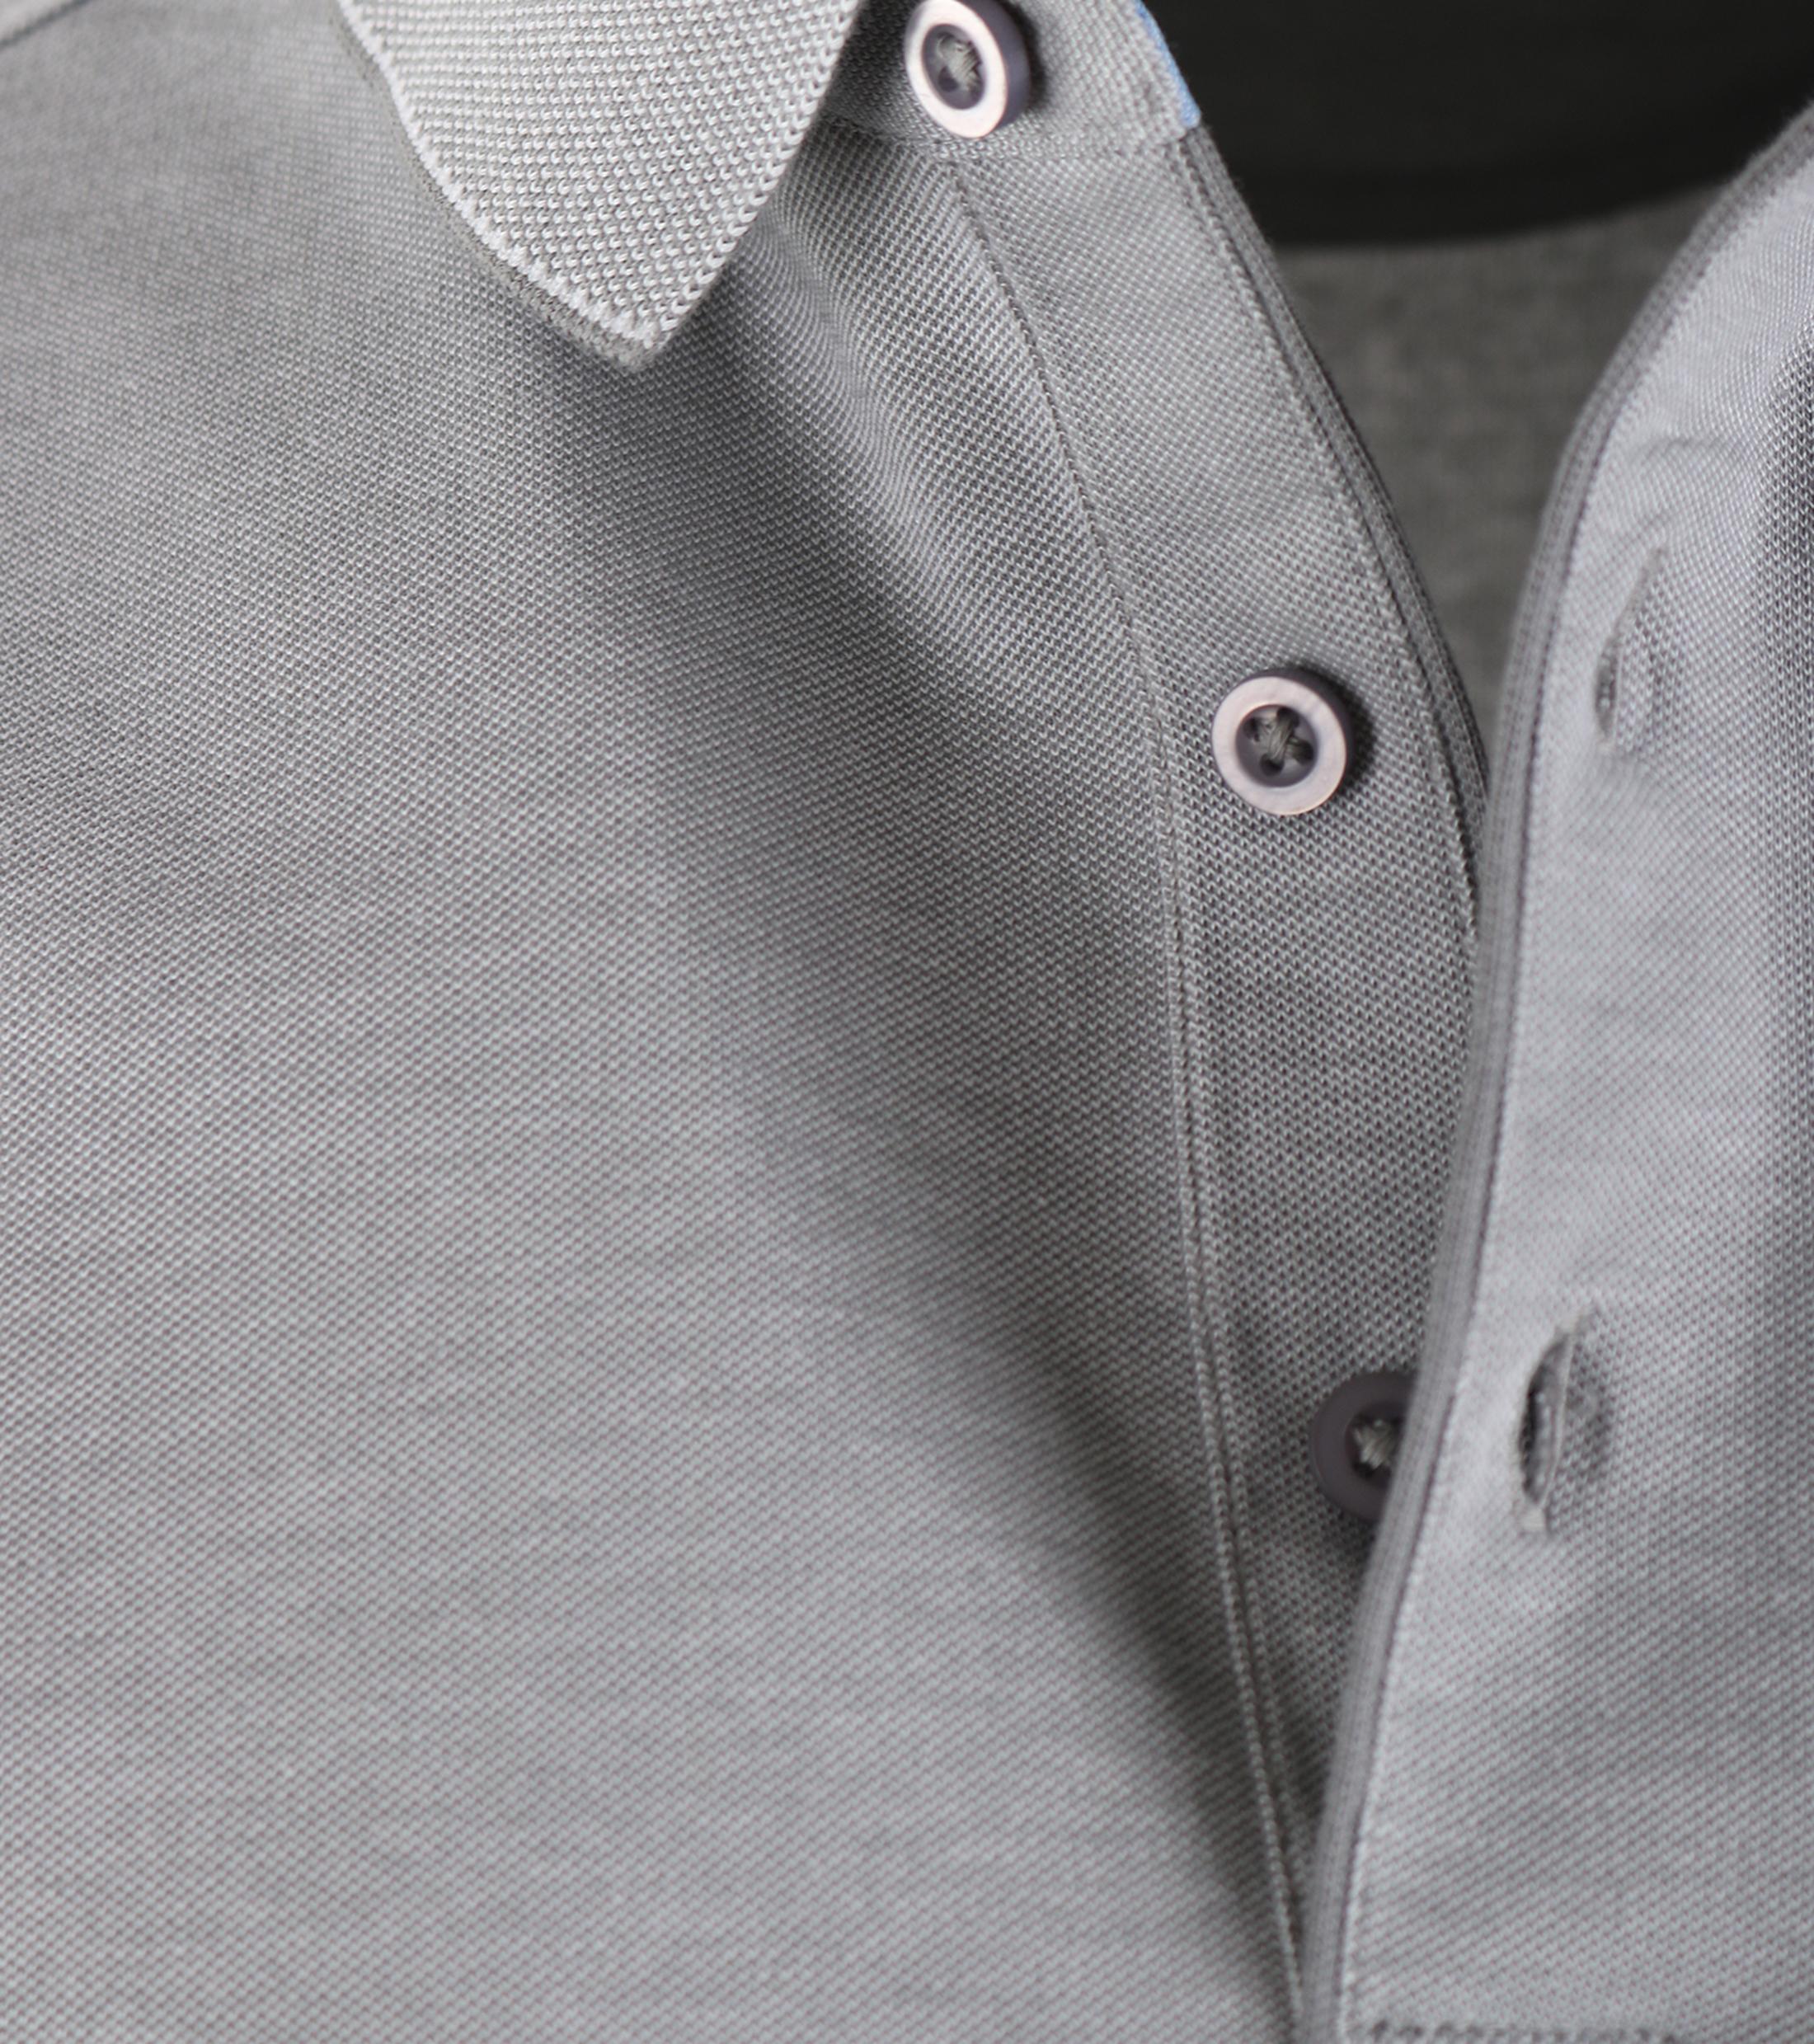 Suitable Polo Oxford Grijs foto 2